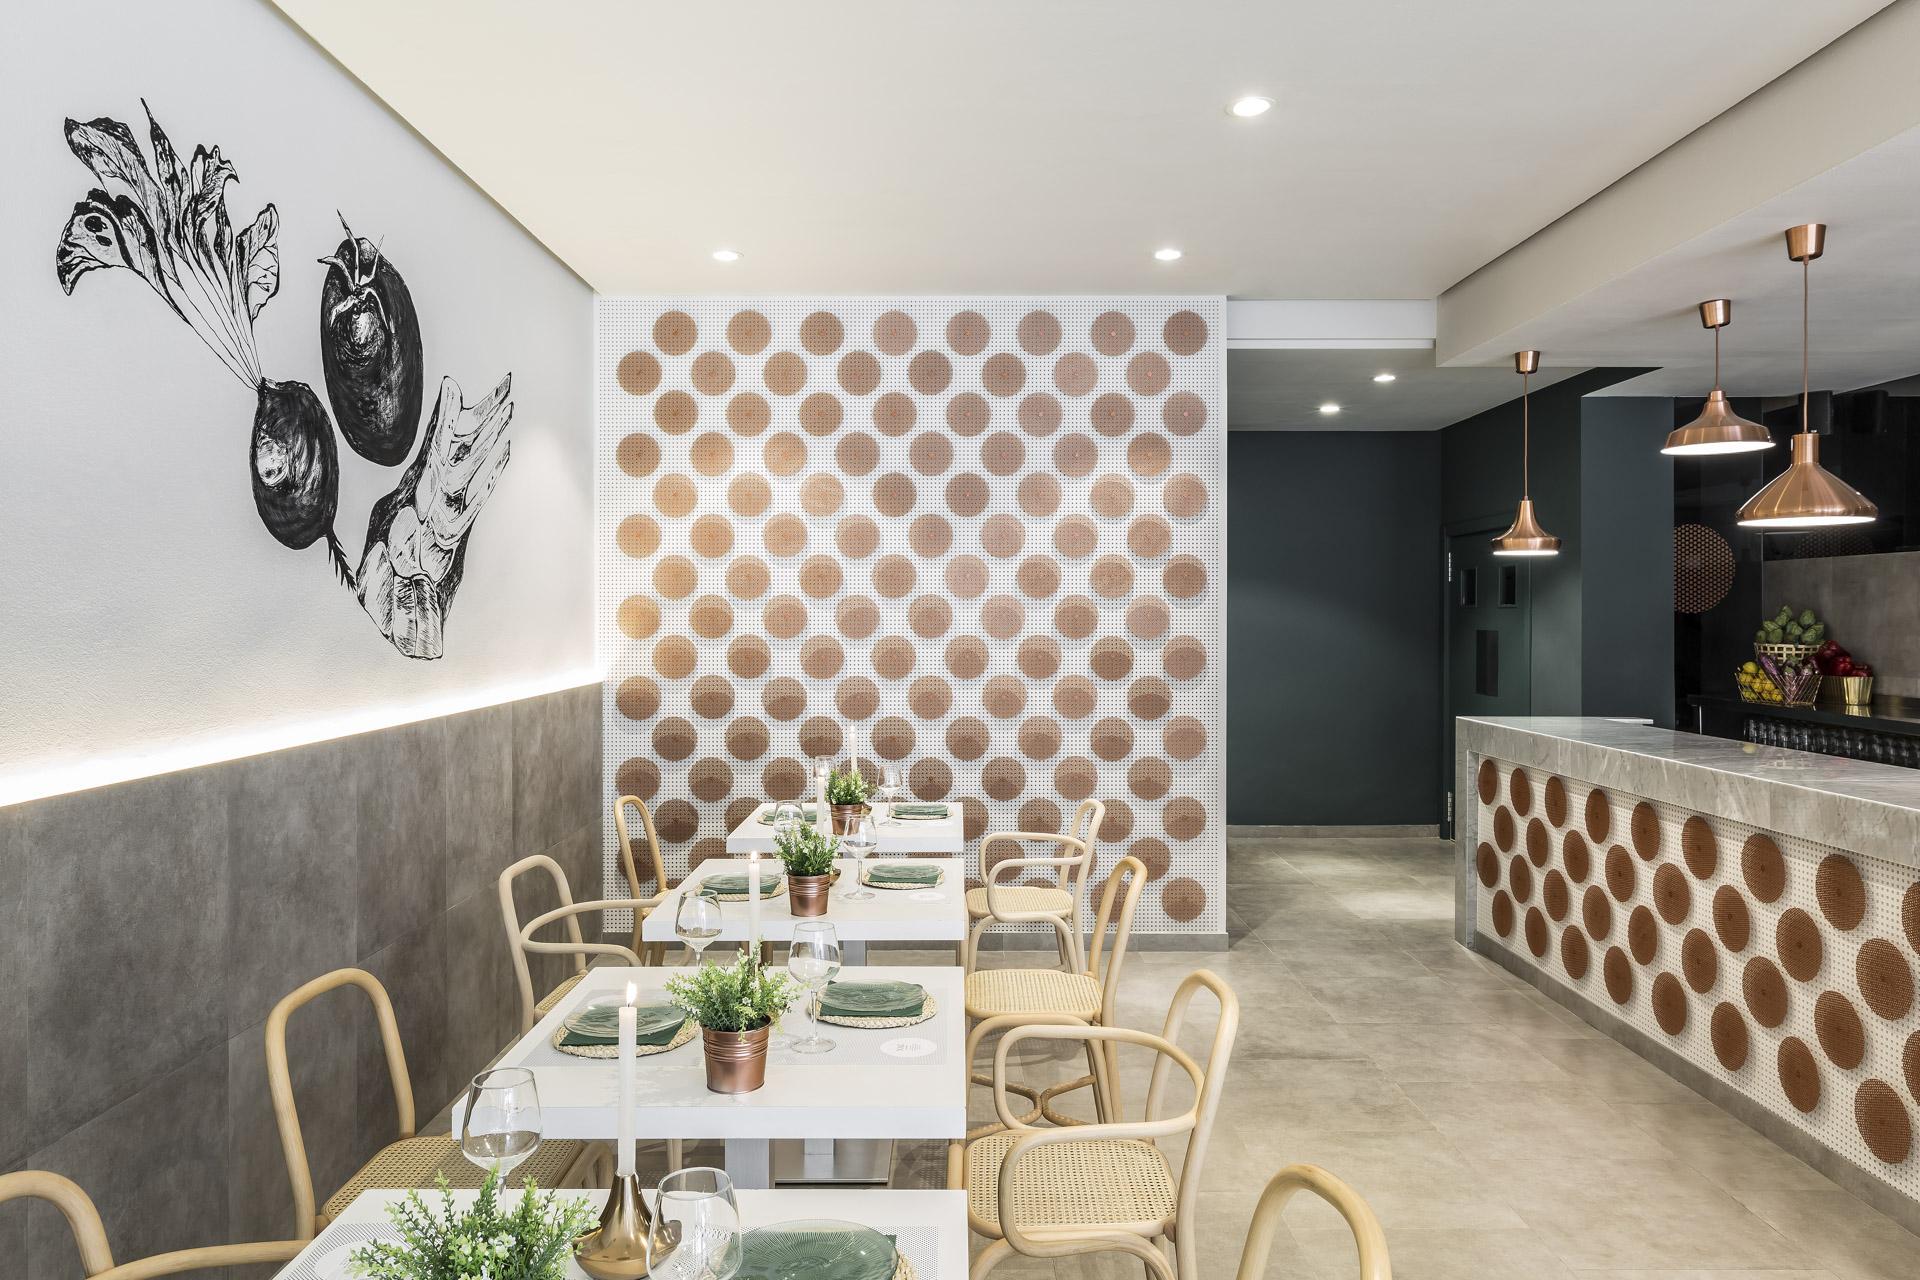 fotografia-arquitectura-valencia-german-cabo-estudihac-restaurante-nac-ontinyent-14